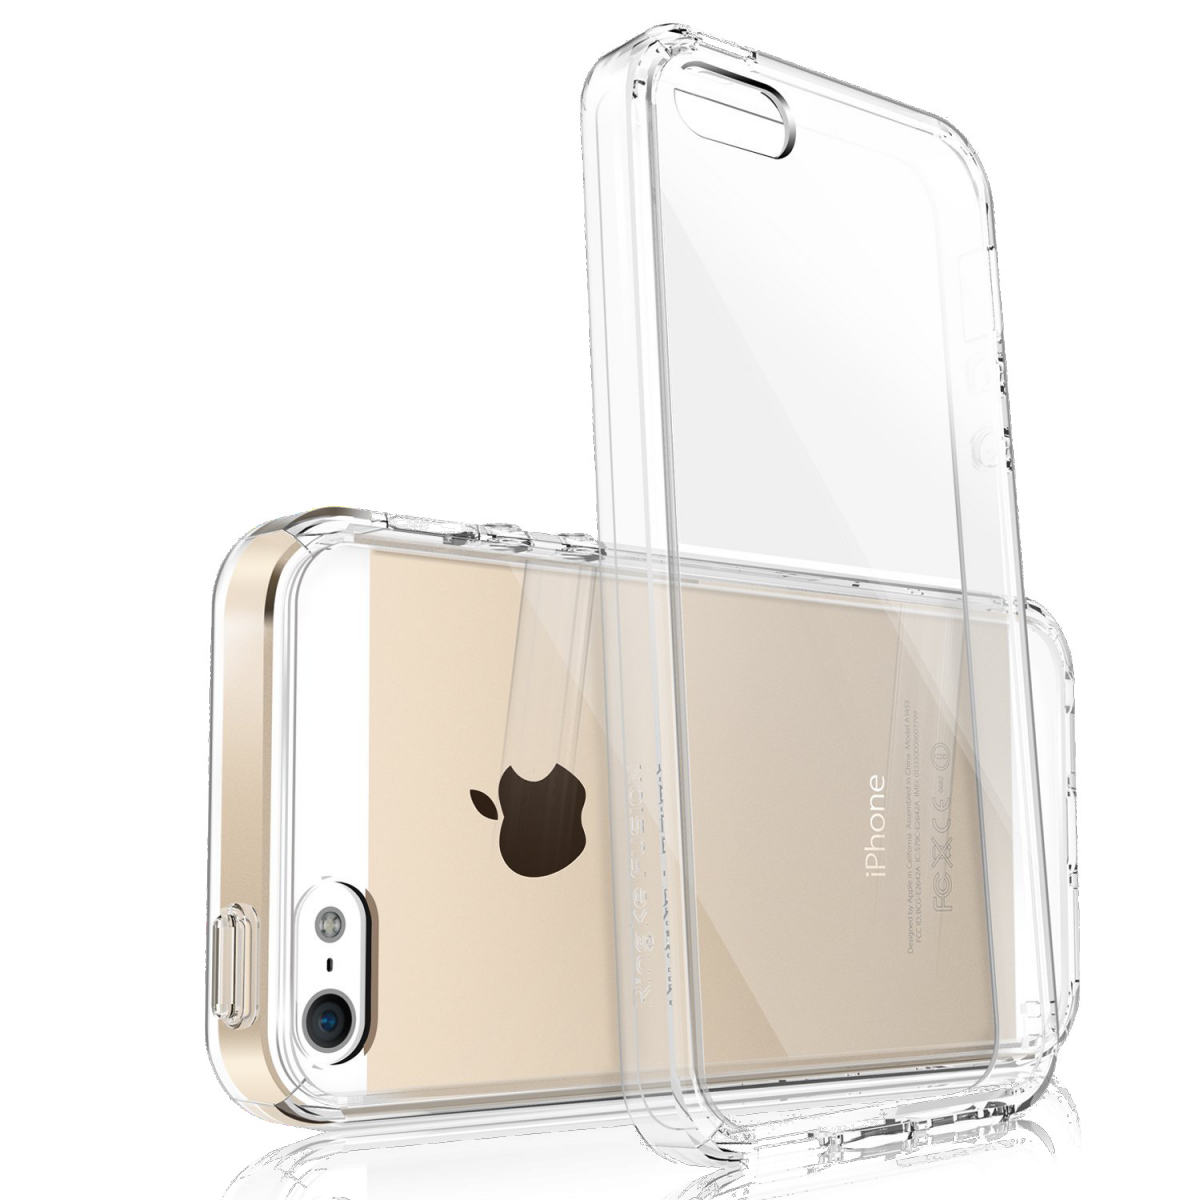 iphone 5 SE pruhledny ciry transparentni obal kryt pouzdro kvalitni silikonove cire